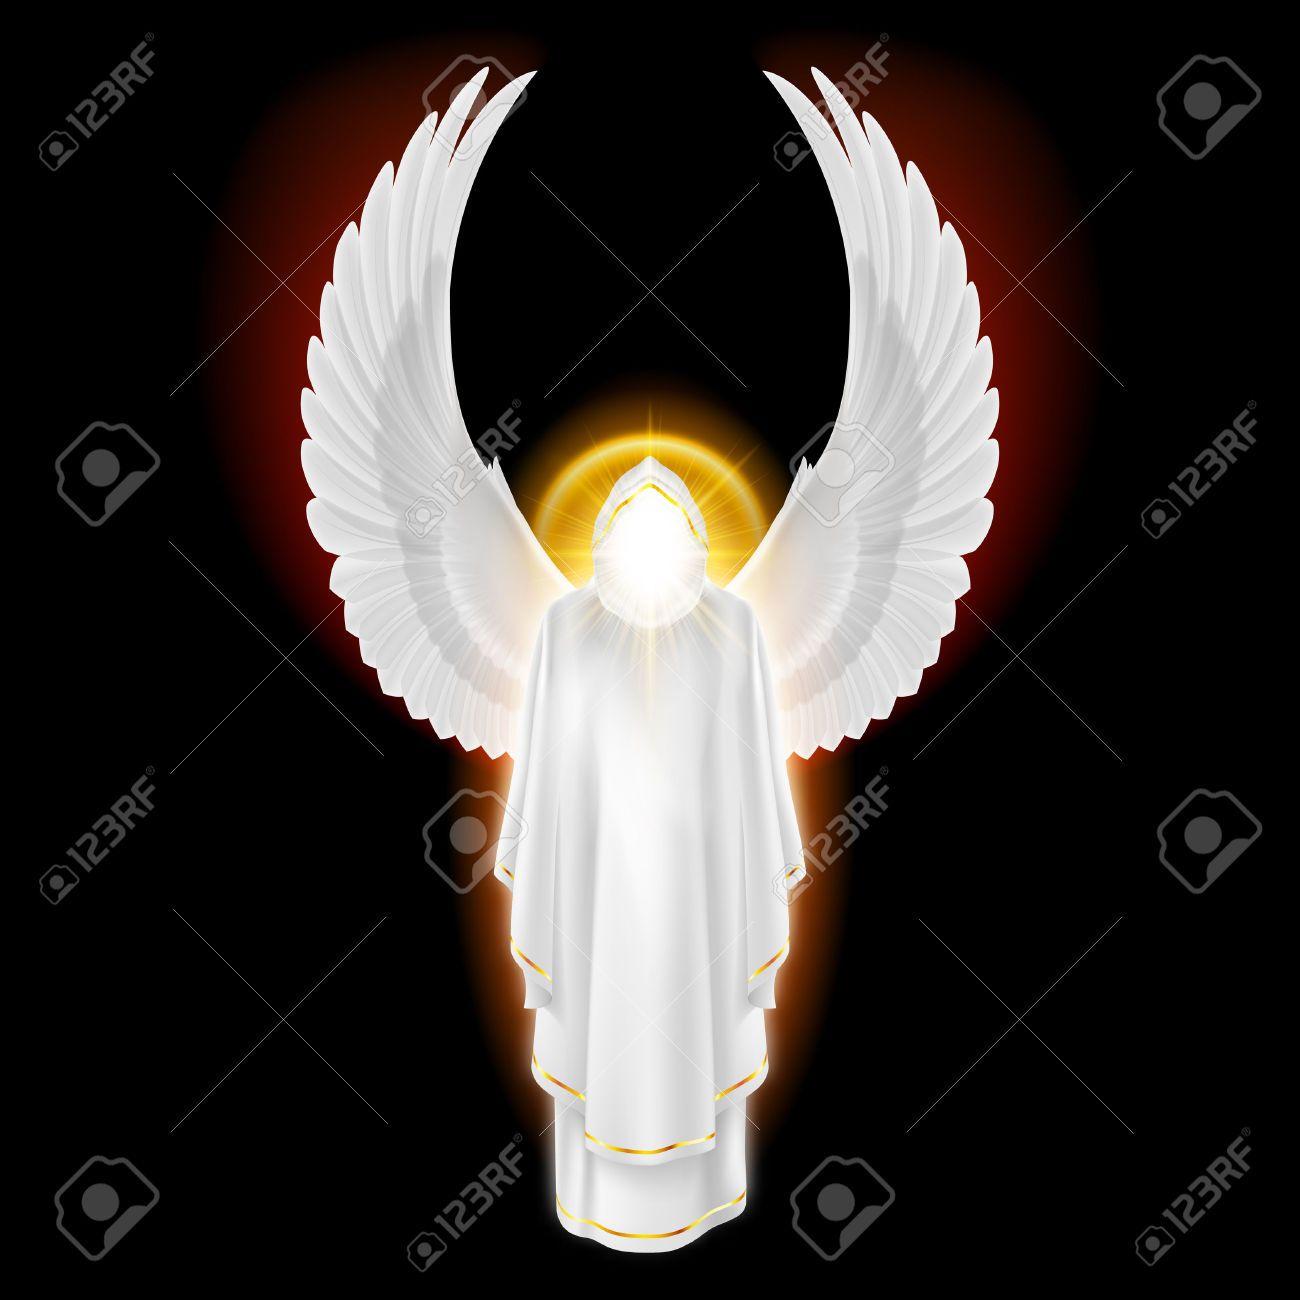 Gods. Angels clipart guardian angel